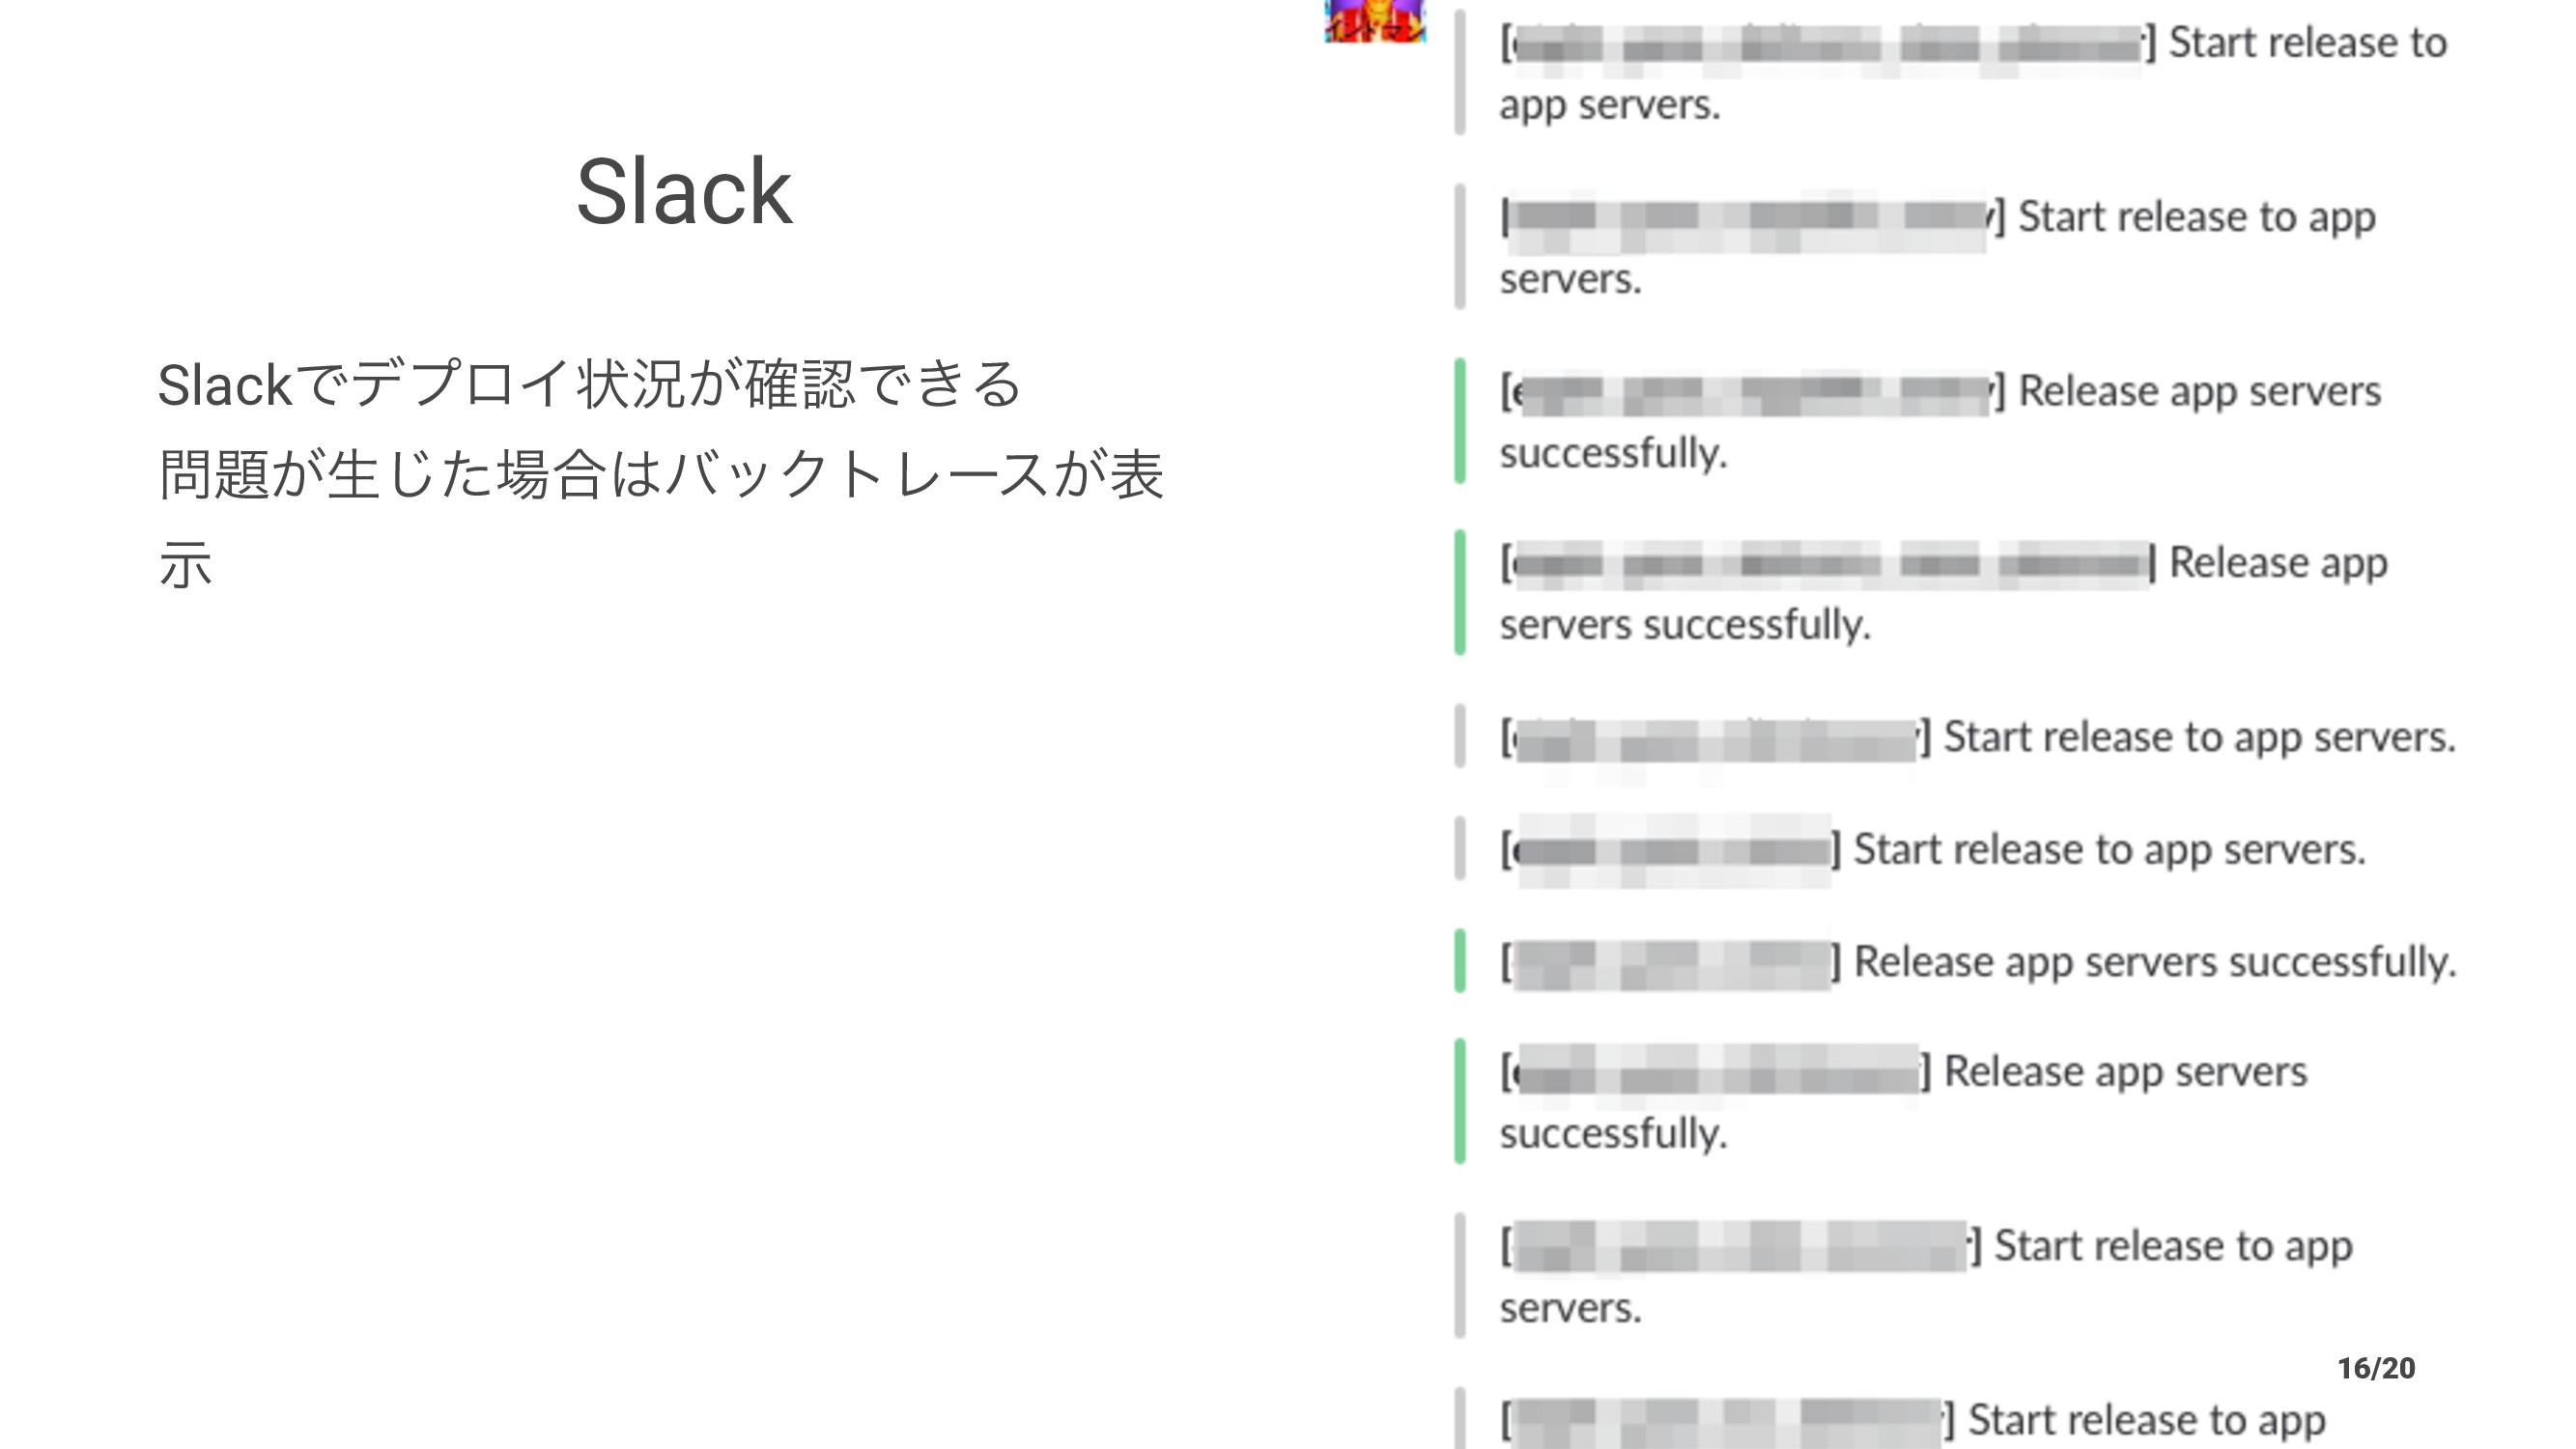 Slack SlackͰσϓϩΠঢ়گ͕֬Ͱ͖Δ ͕ੜͨ͡߹όοΫτϨʔε͕ද ࣔ 1...